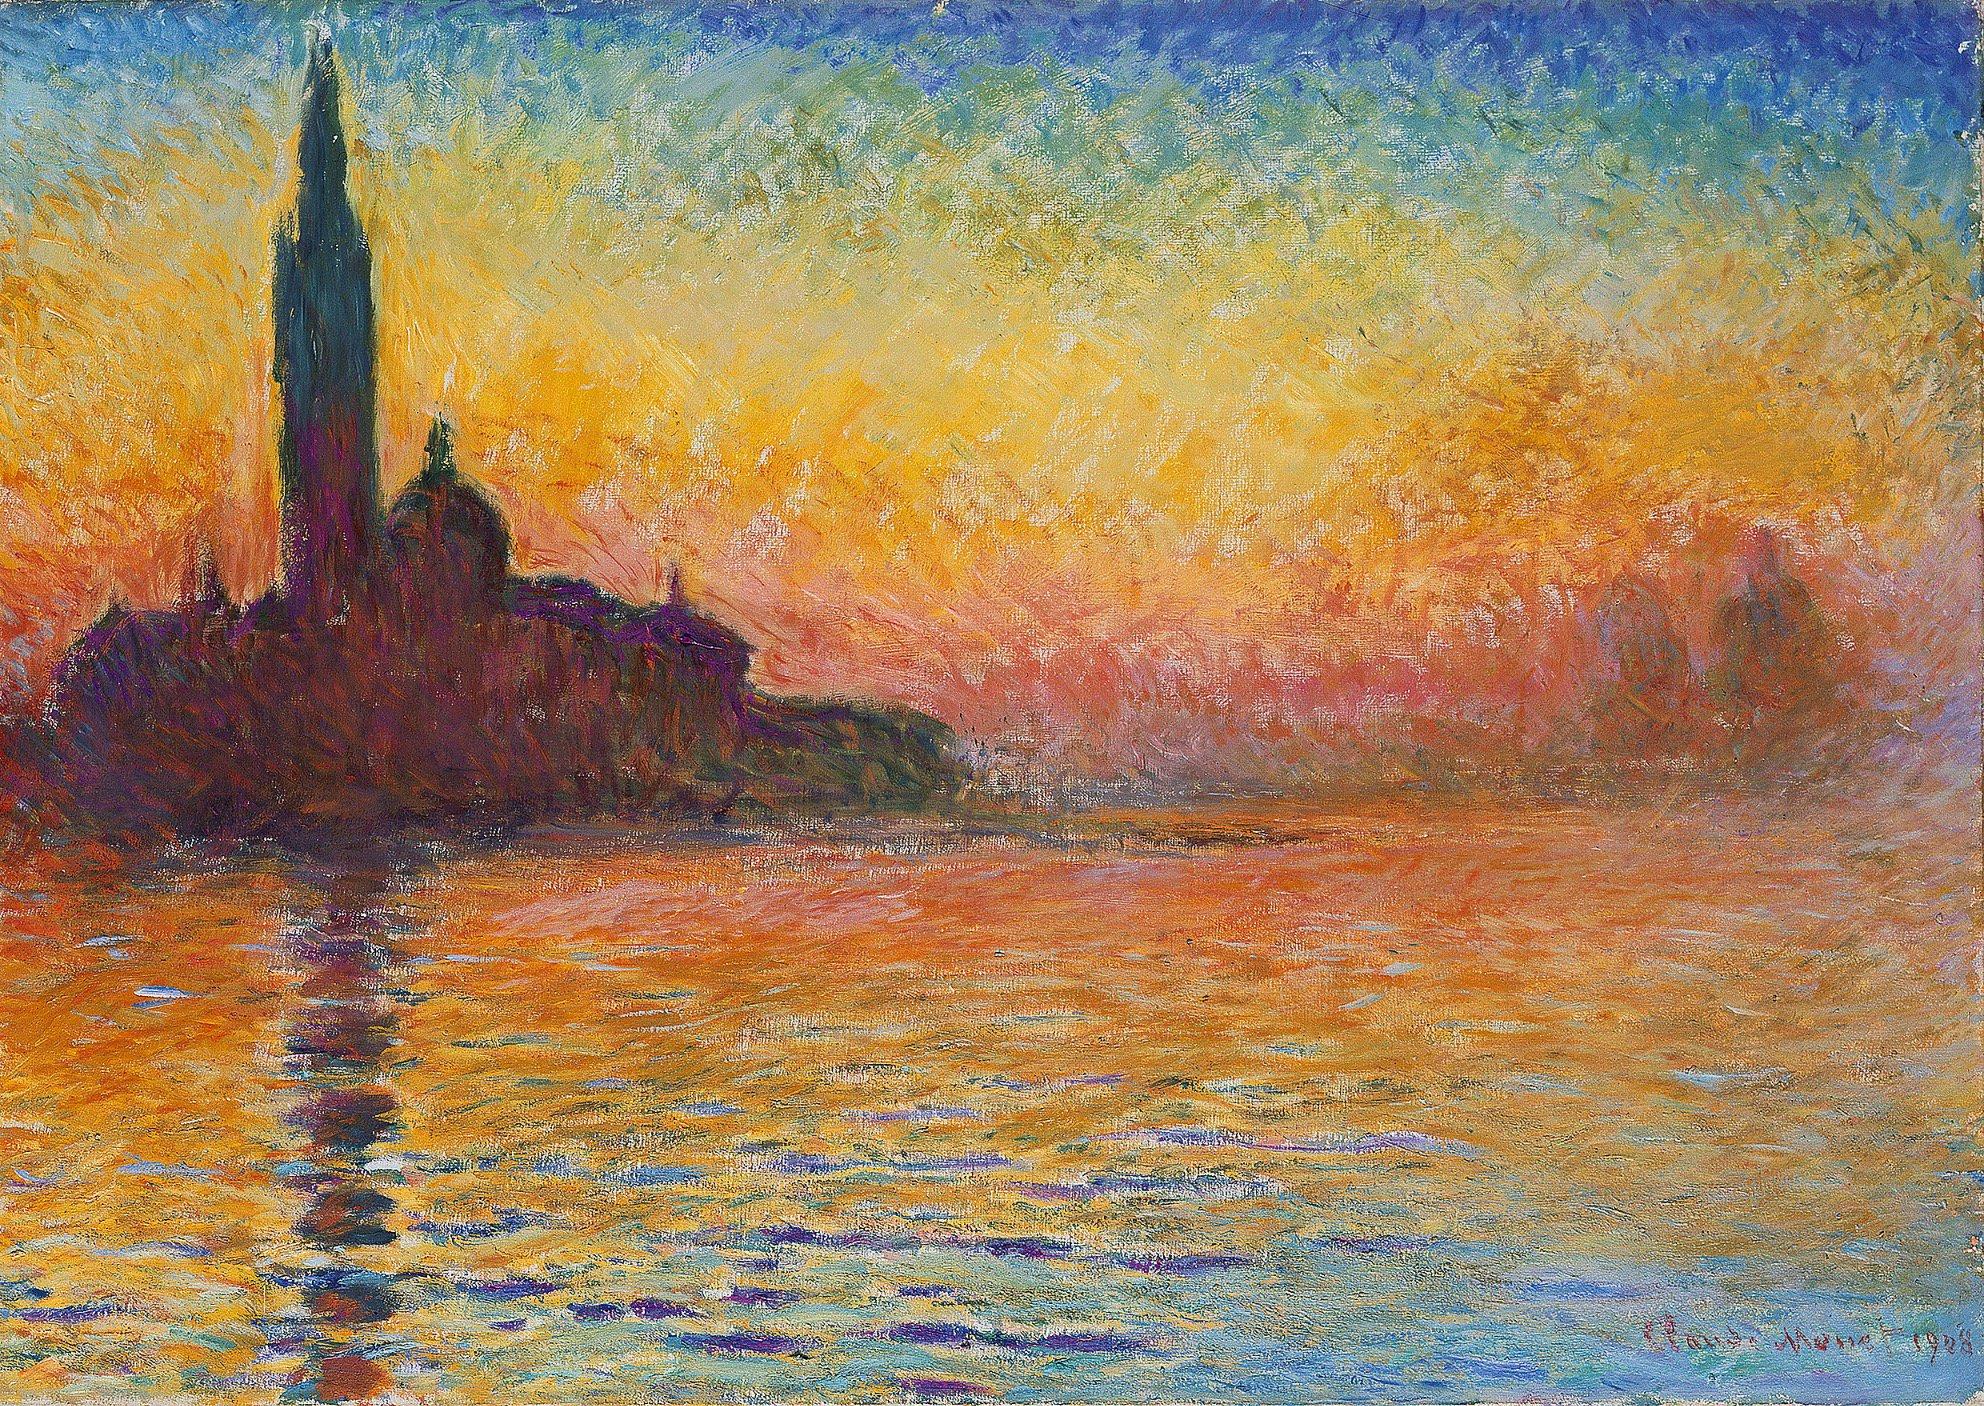 Resultado de imagem para Claude Monet, Crepúsculo em Saint-Georges-Majeur